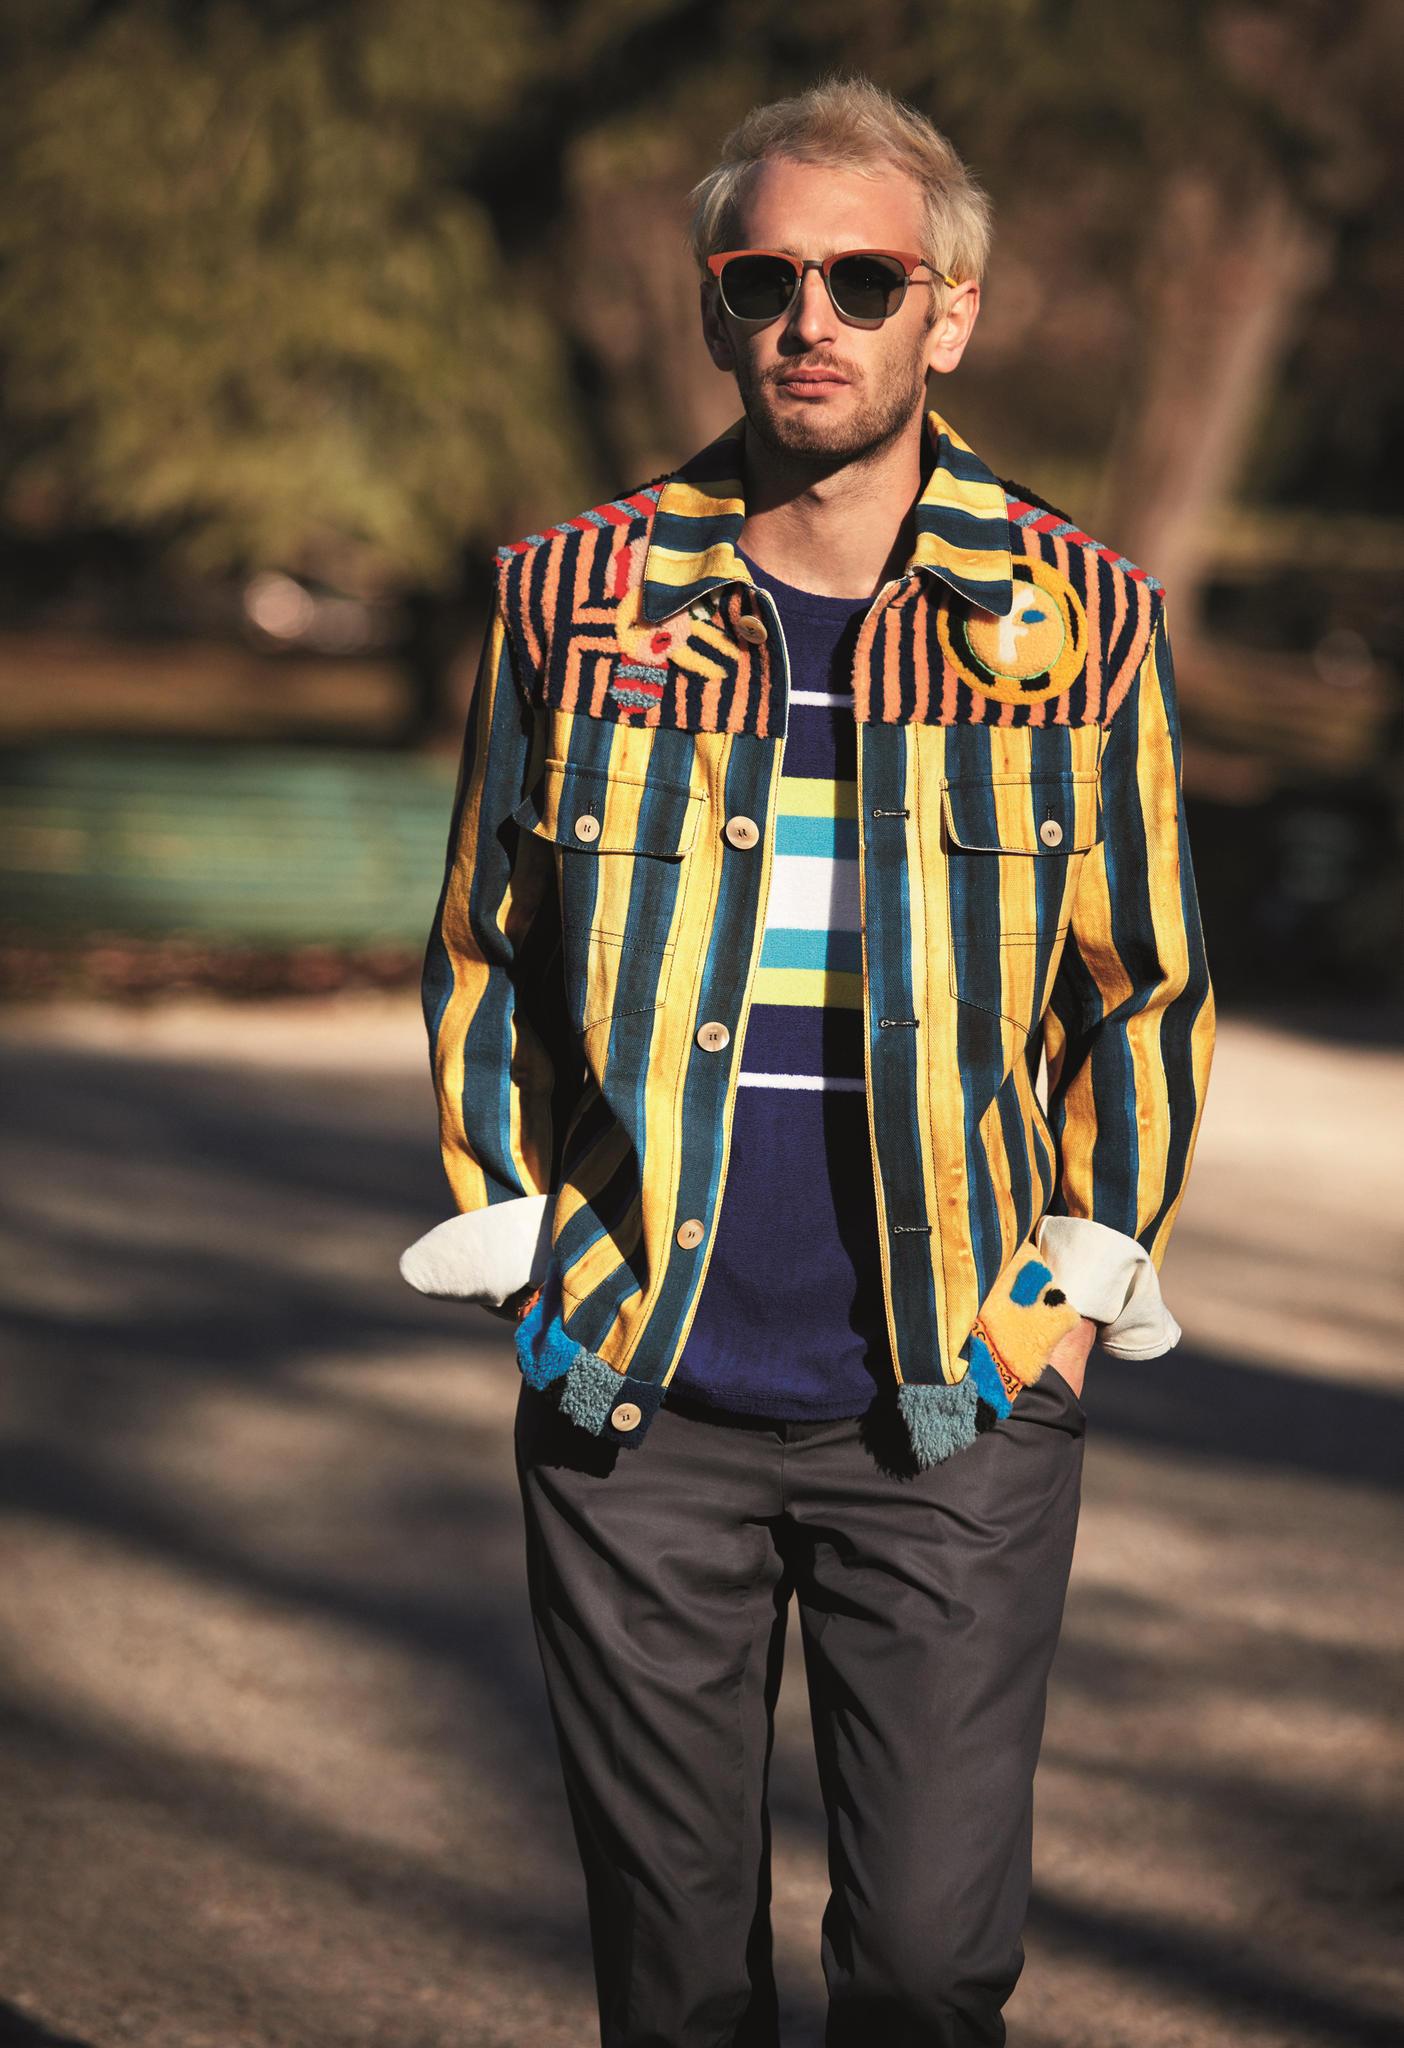 Hopper Penn, der Sohn von Sean Penn und Robin Wright, im Fendi-Look, coole Sonnenbrille inklusive